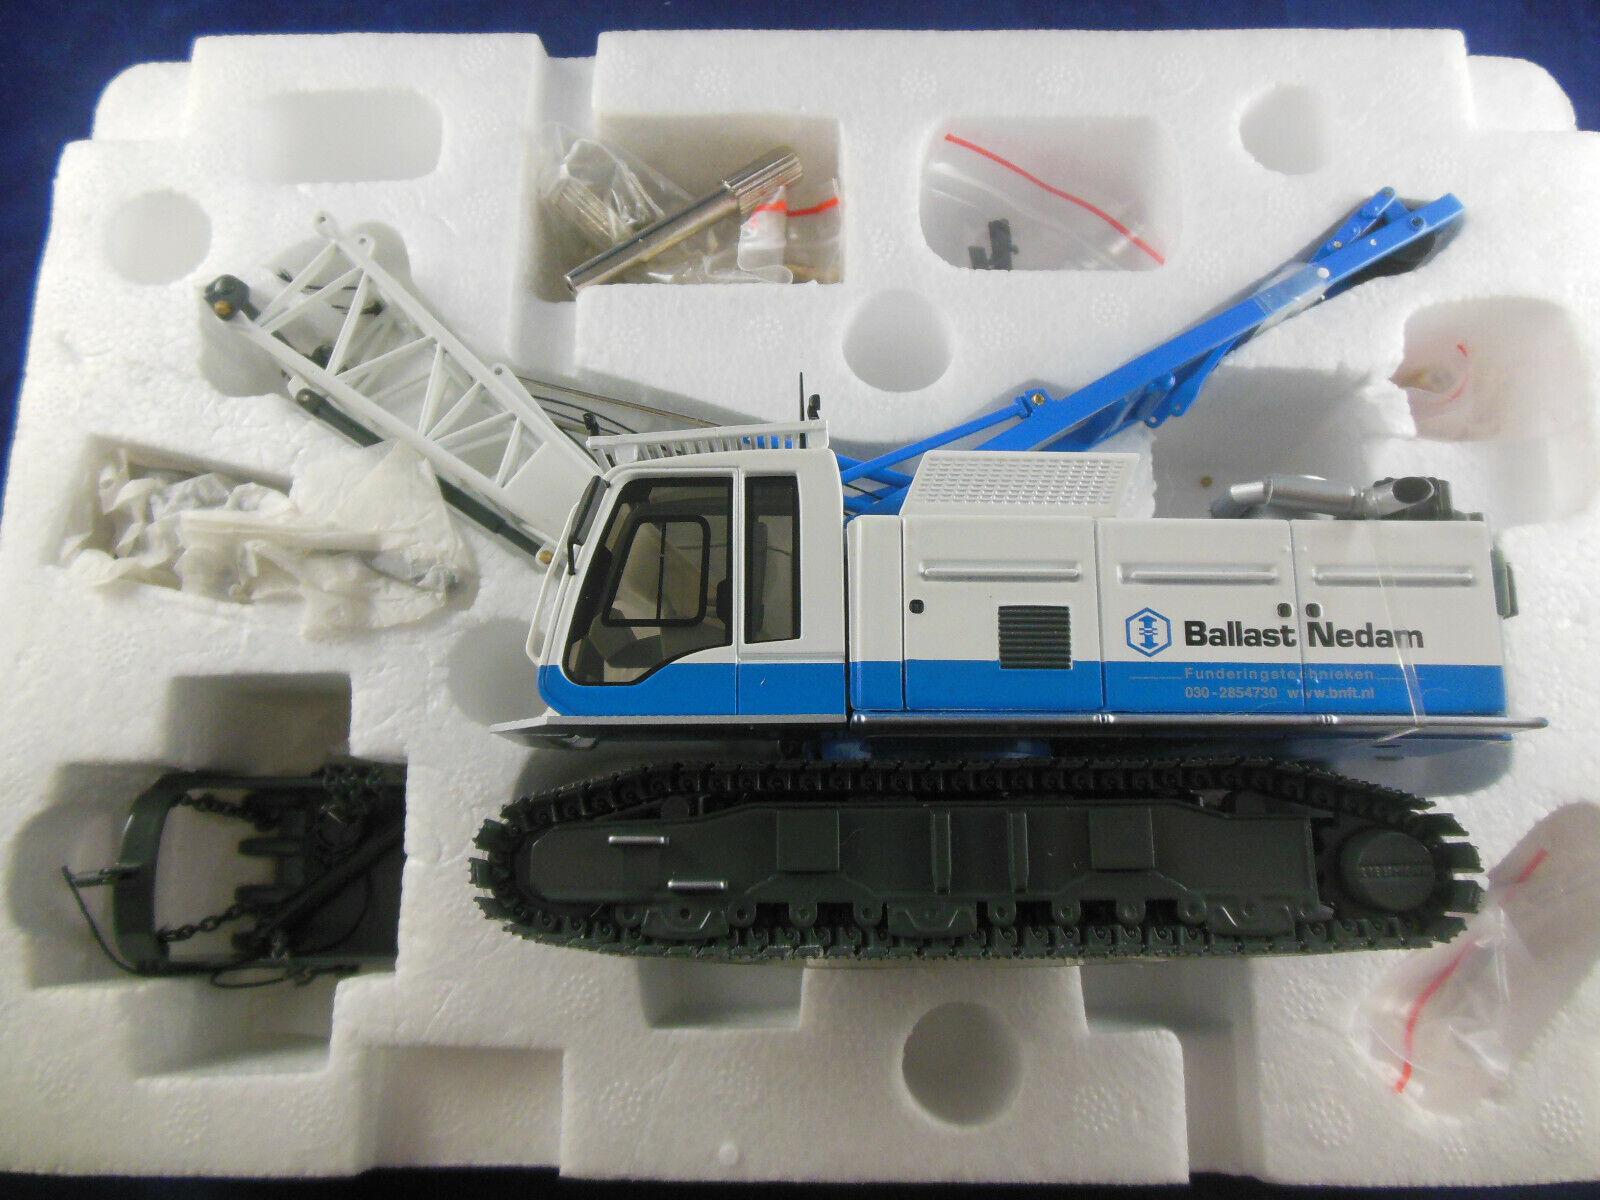 NZG Art. 728 02 Liebherr HS855 HD Litronic Duty Cycle Crawler Crane 1 50 Scale